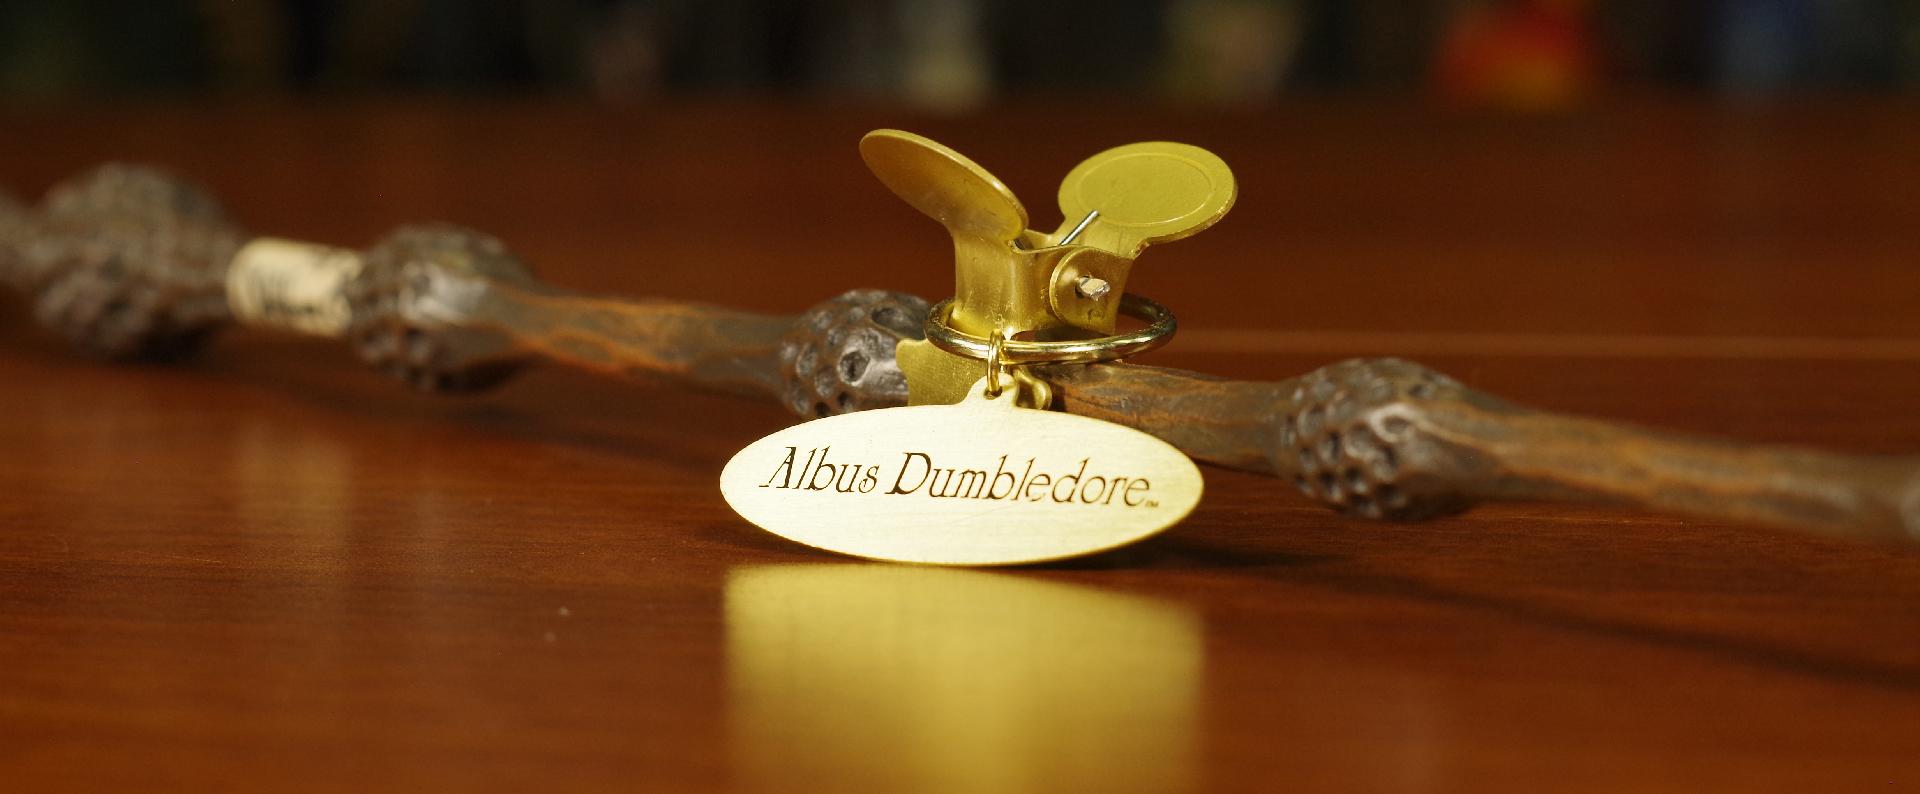 Harry Potter, Professor Dumbledore Zauberstab Charakter Edition